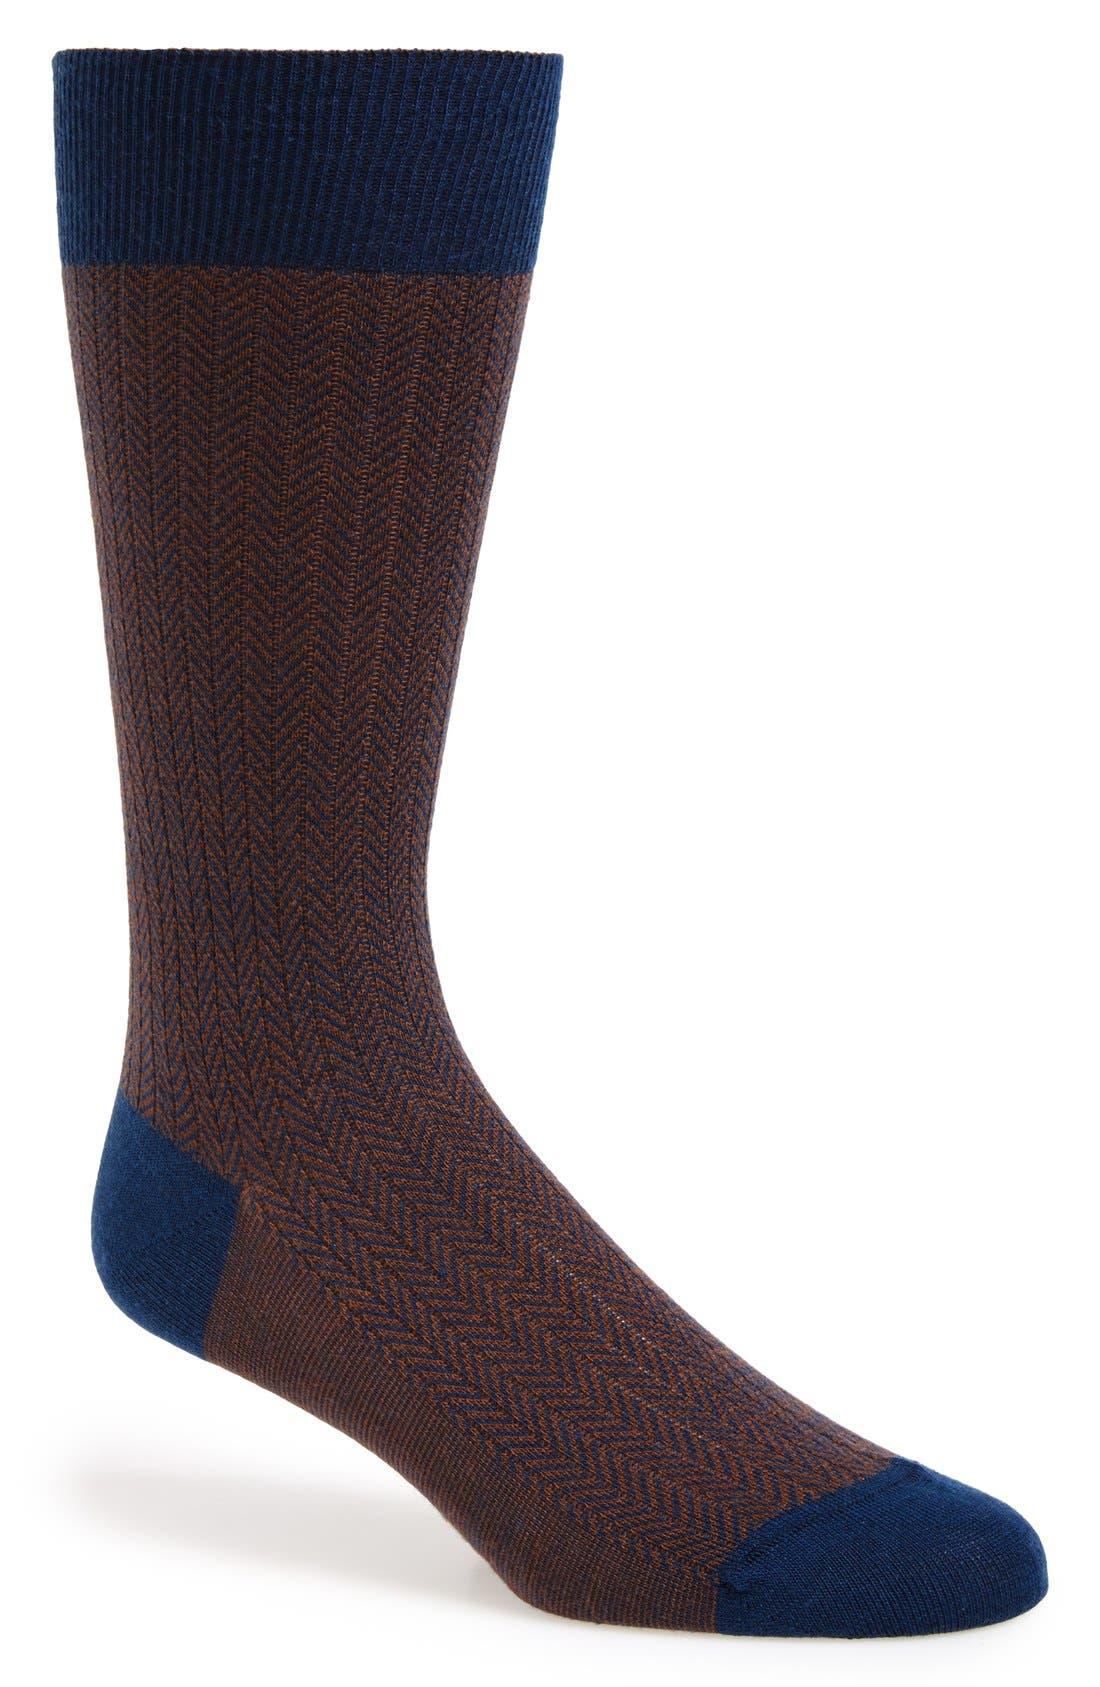 Alternate Image 1 Selected - Pantherella '5911' Mid-Calf Dress Socks